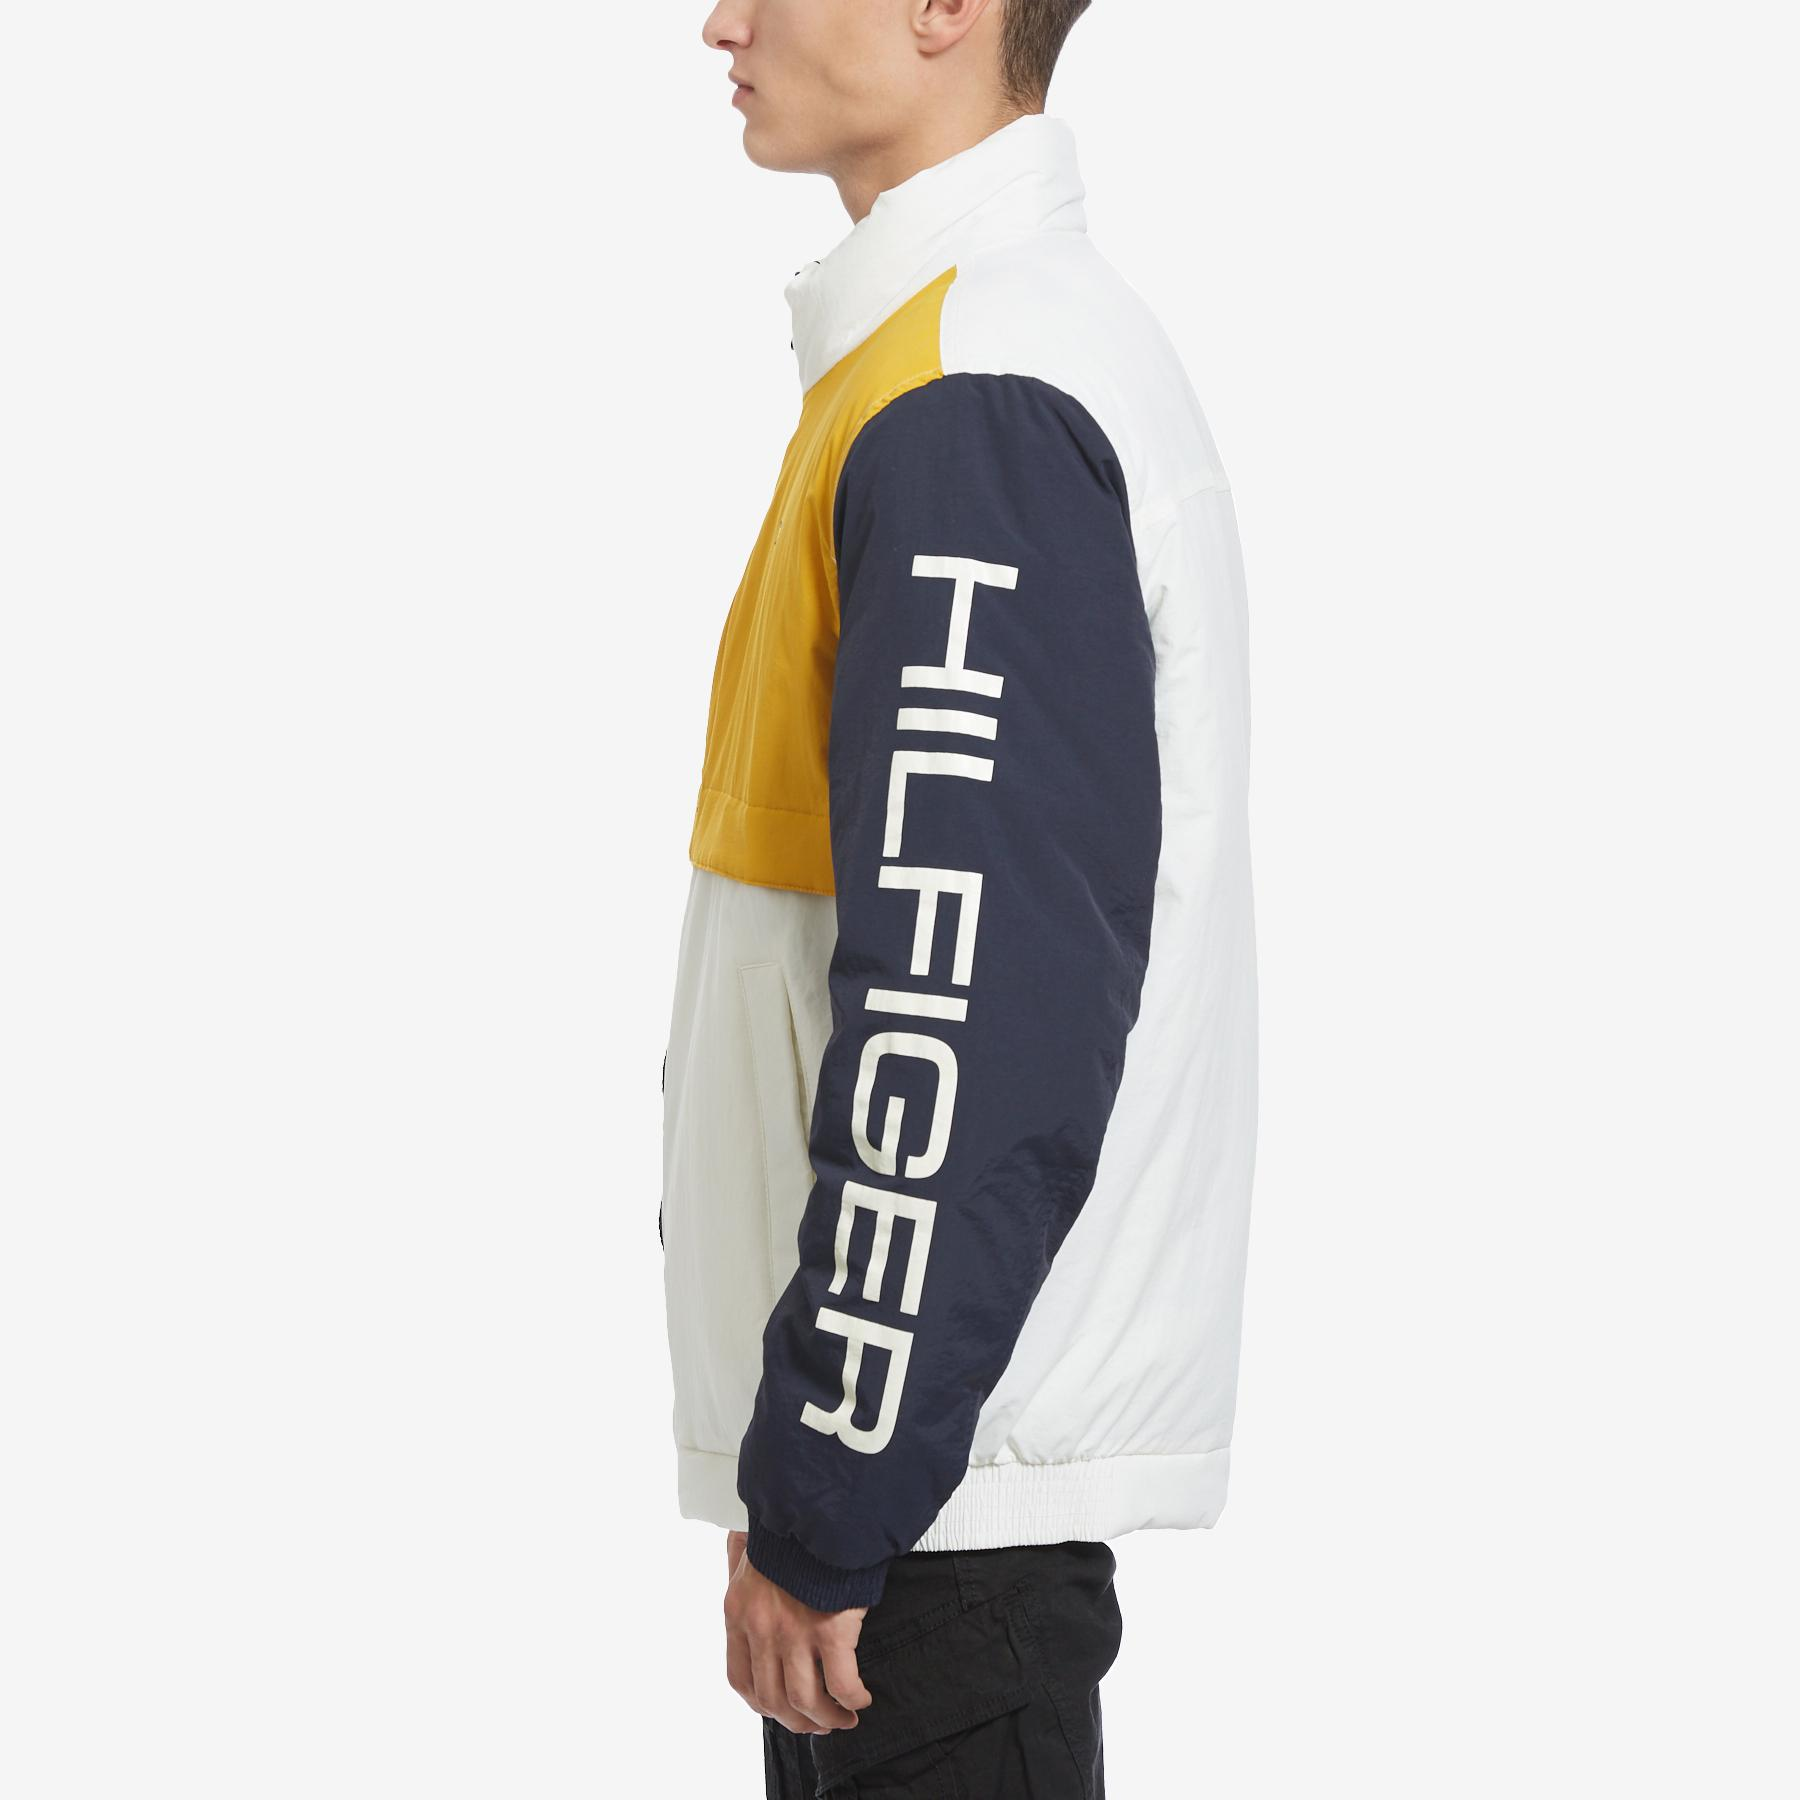 Tommy Hilfiger Retro Puffer Jacket $129.99 $119.98